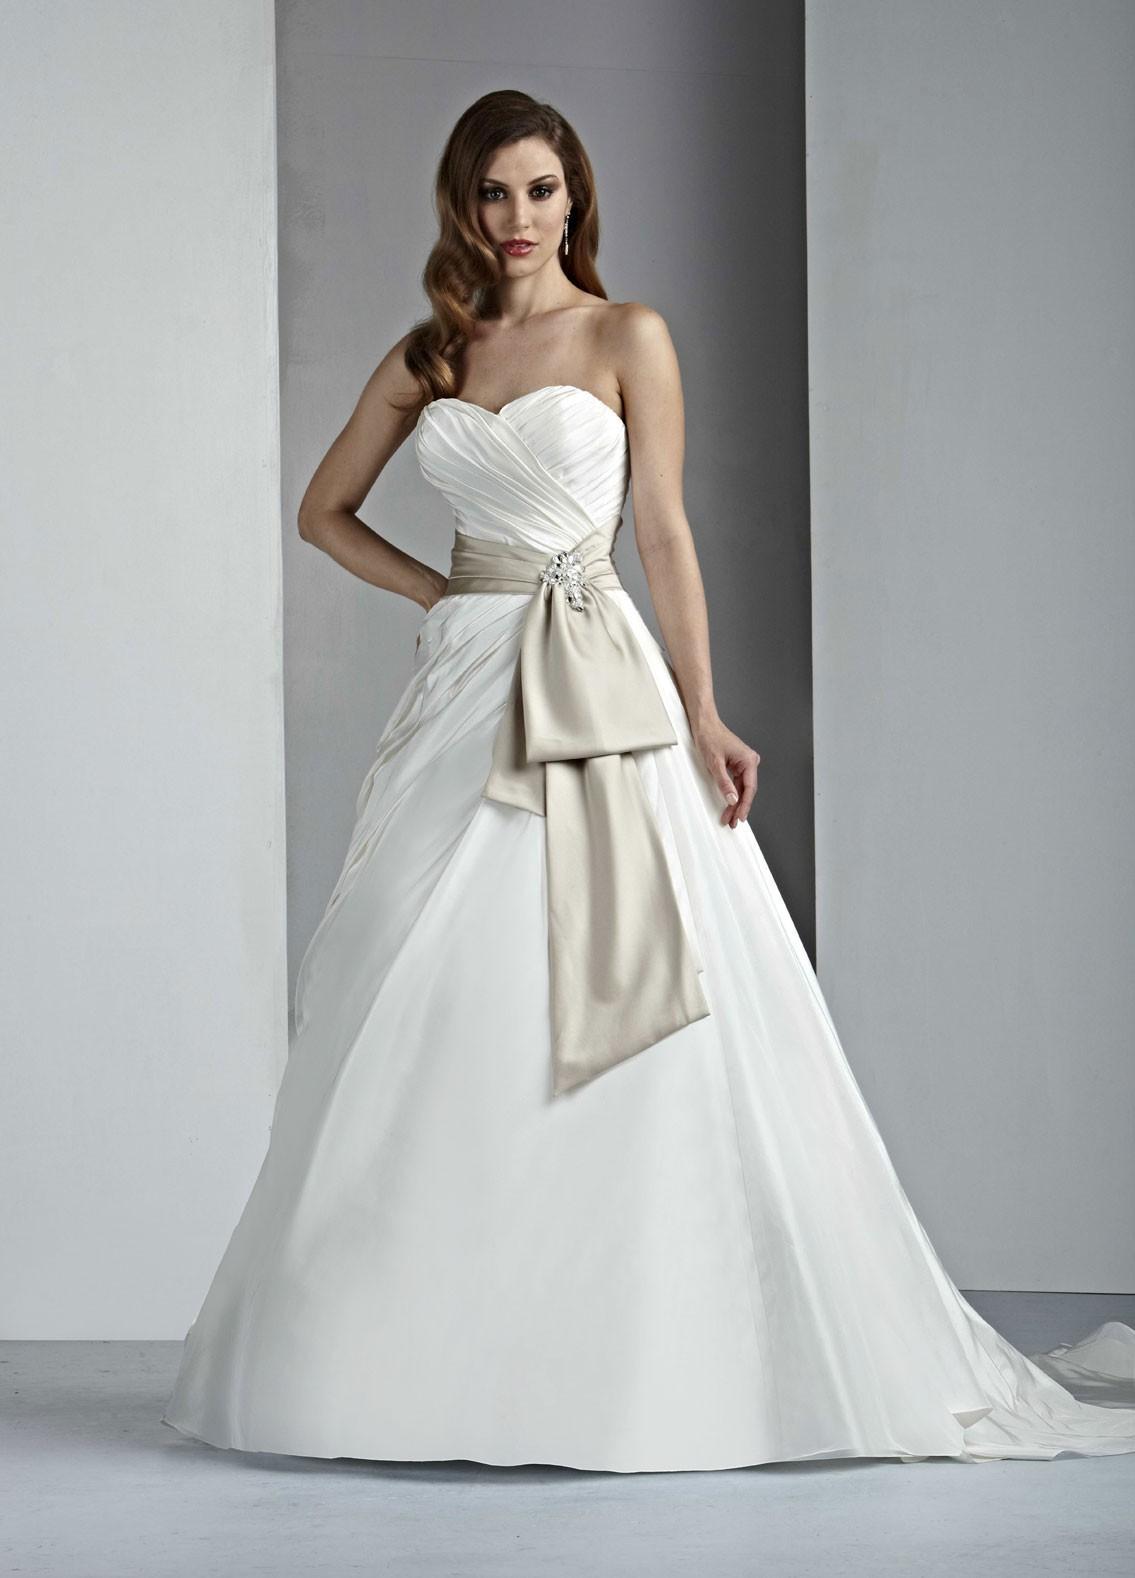 Sweetheart Neckline Taffeta Bridal Gown affordable